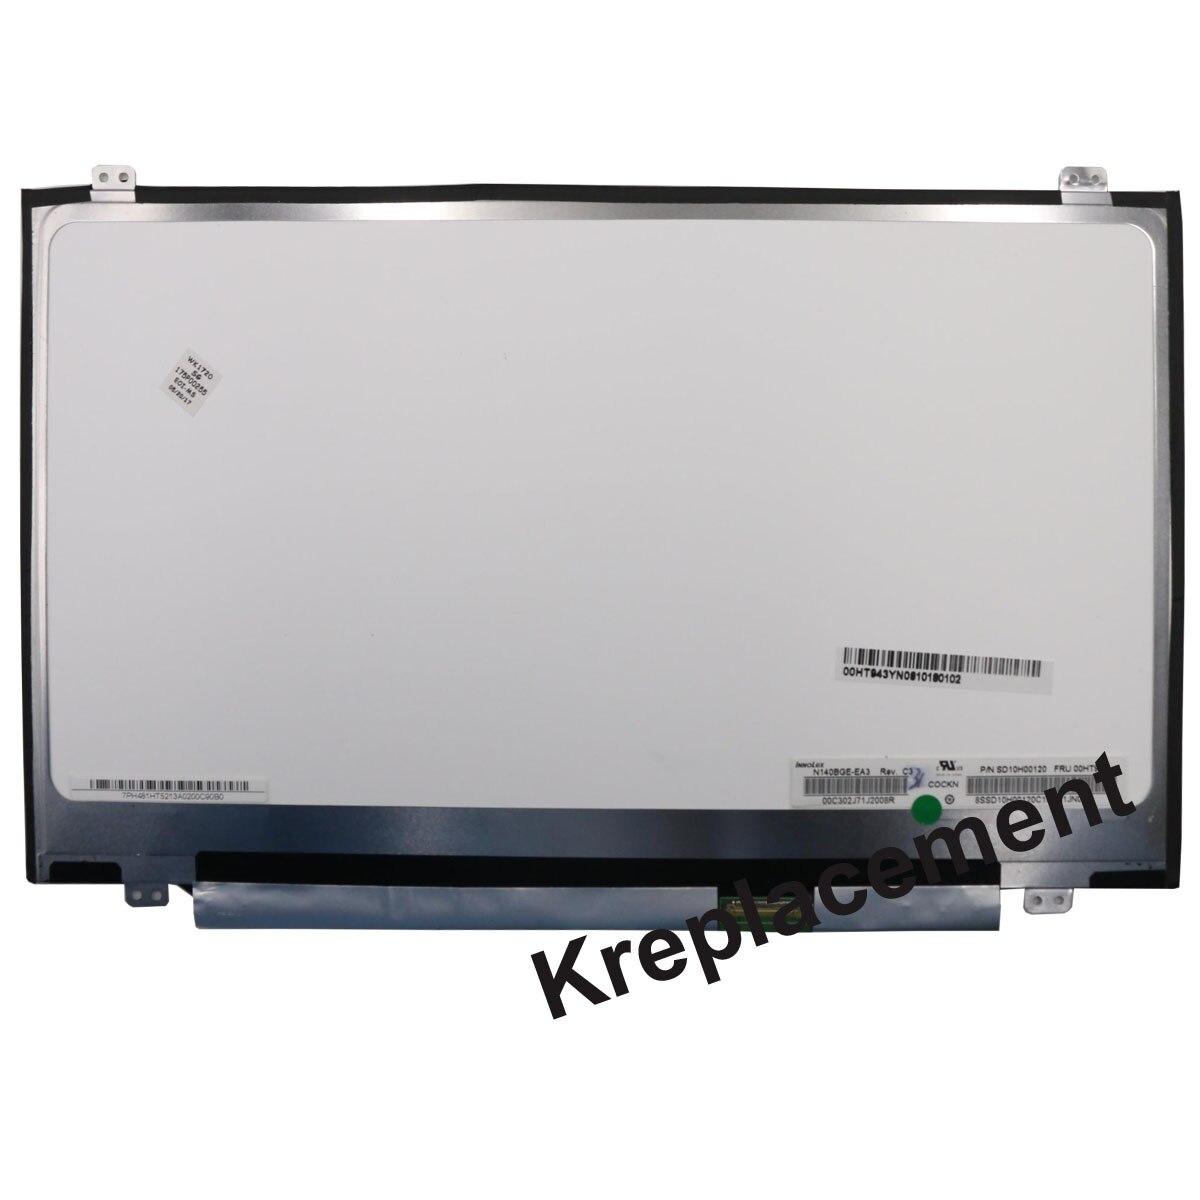 "Reemplazo del Panel de pantalla LCD de 14 ""1080 P FHD para Lenovo Thinkpad T460 20FM 20FN-no táctil versión"